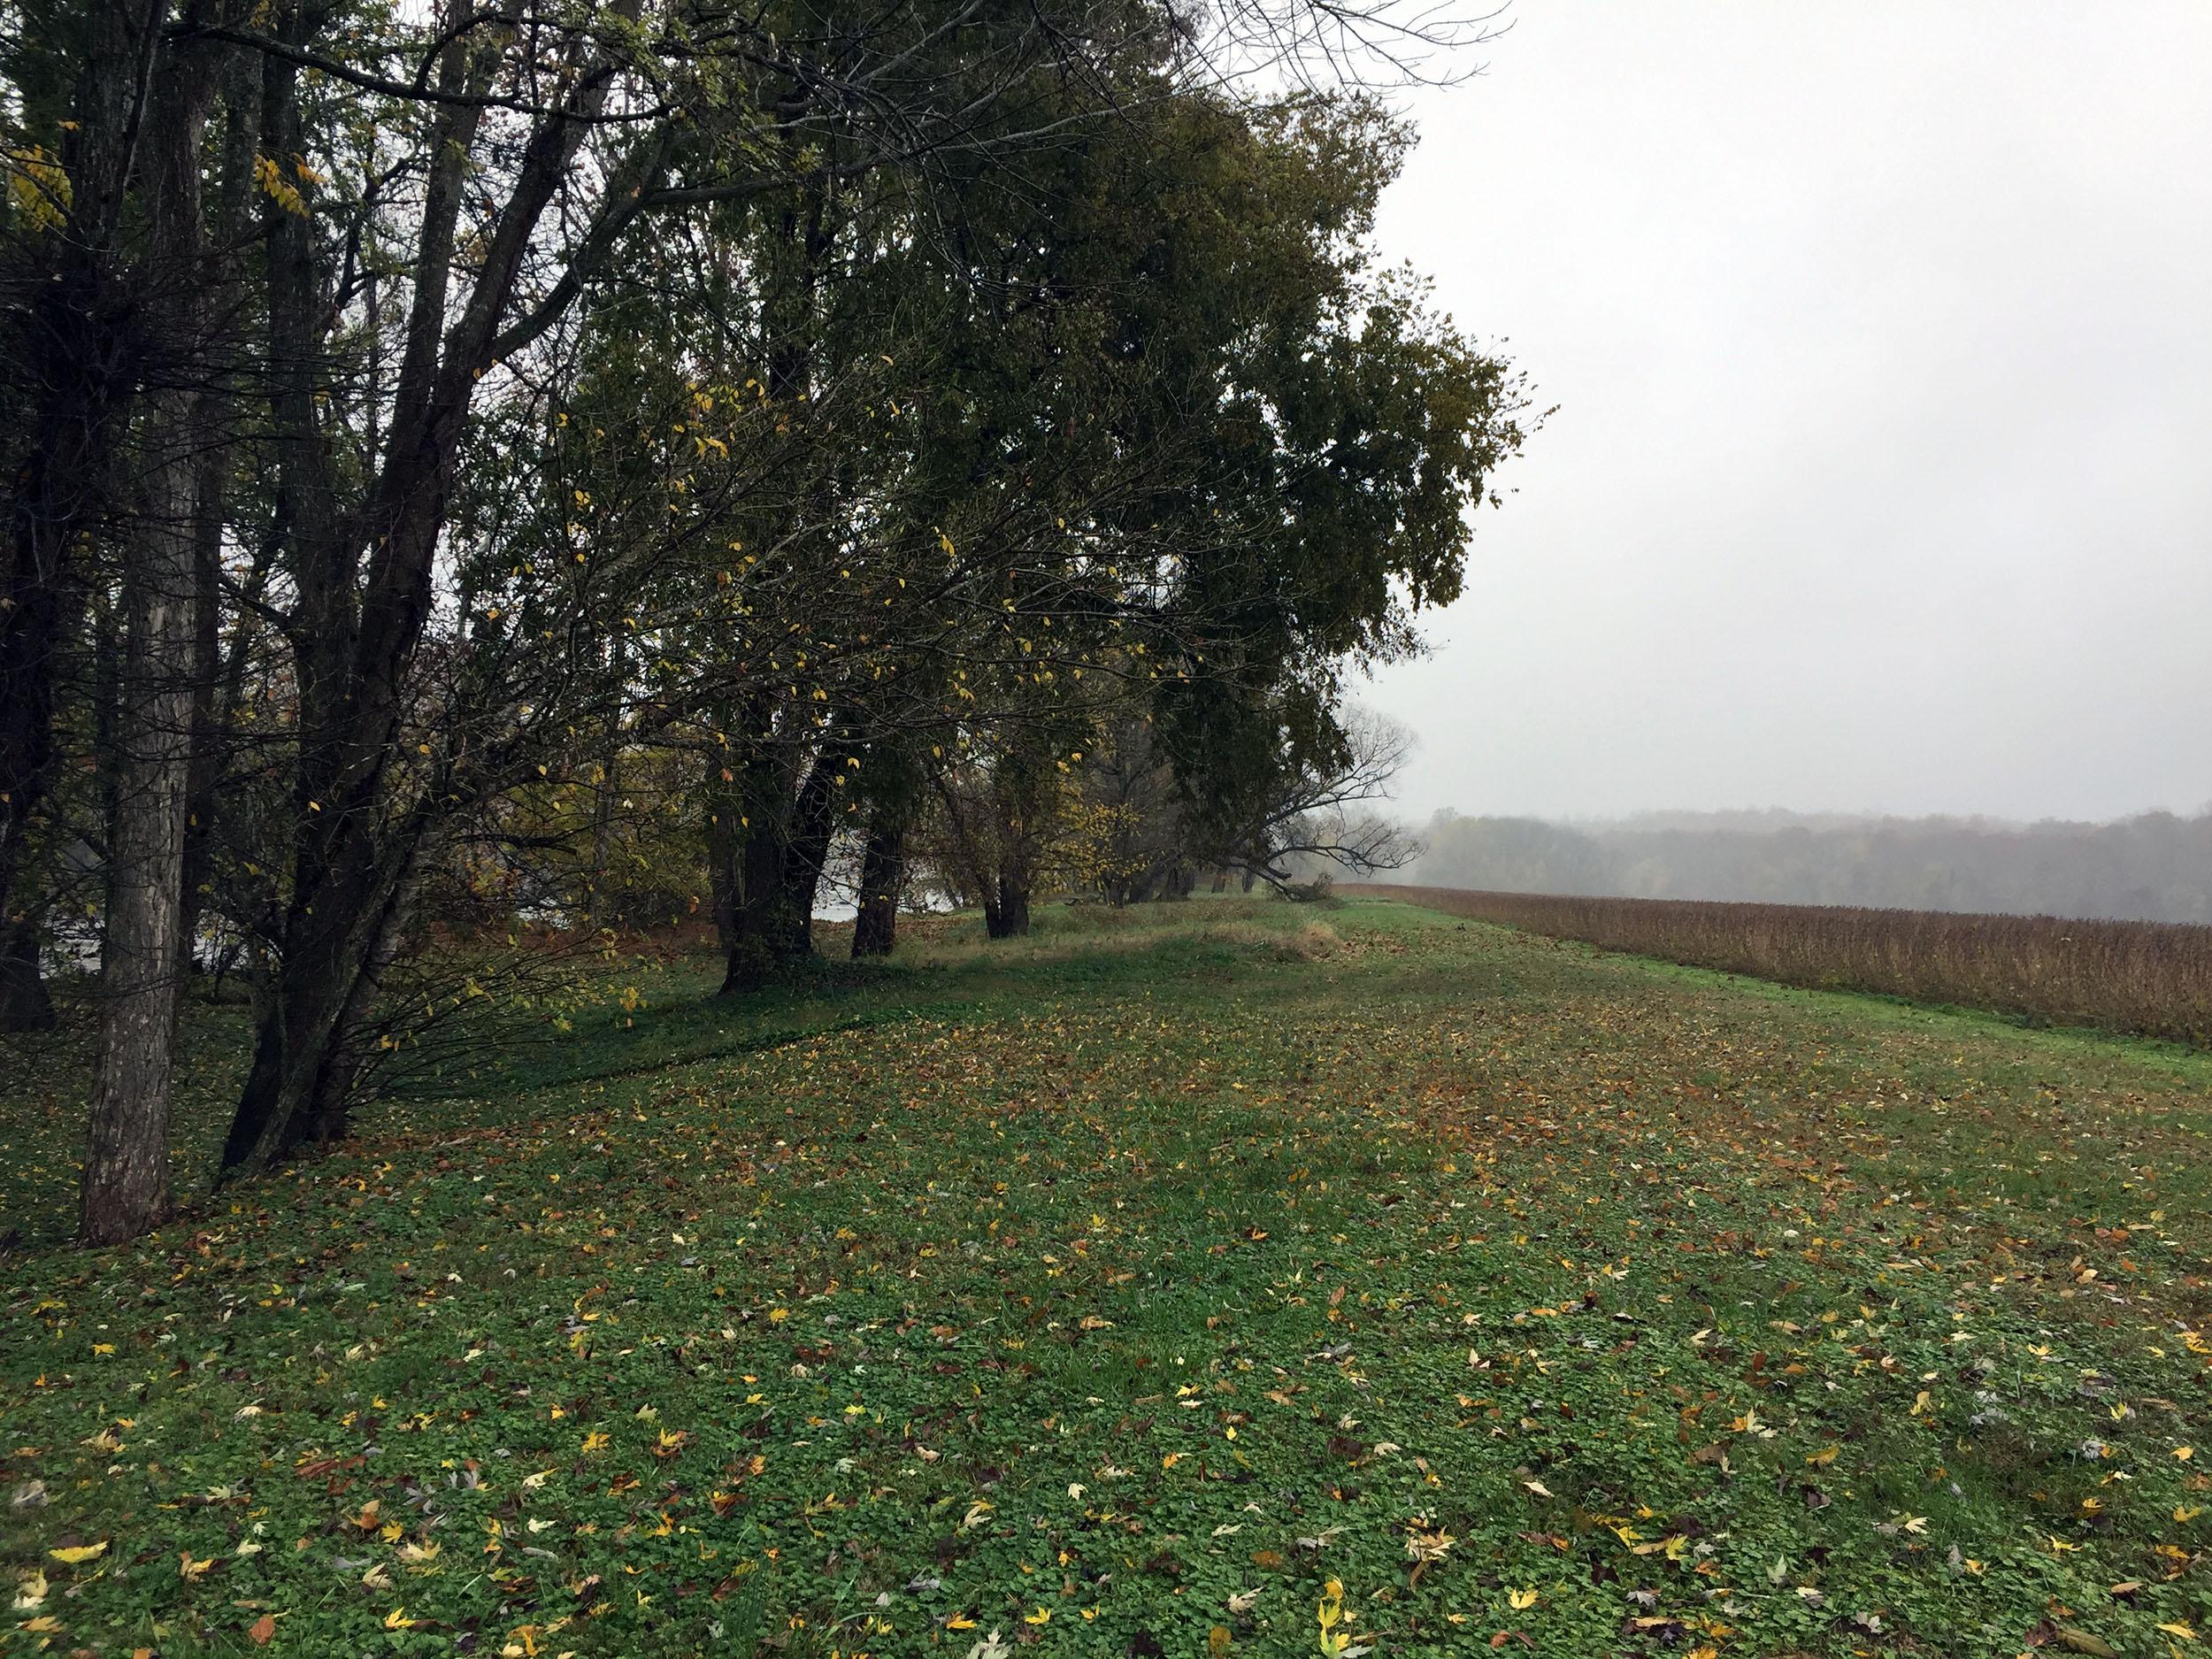 James-River-field.jpg